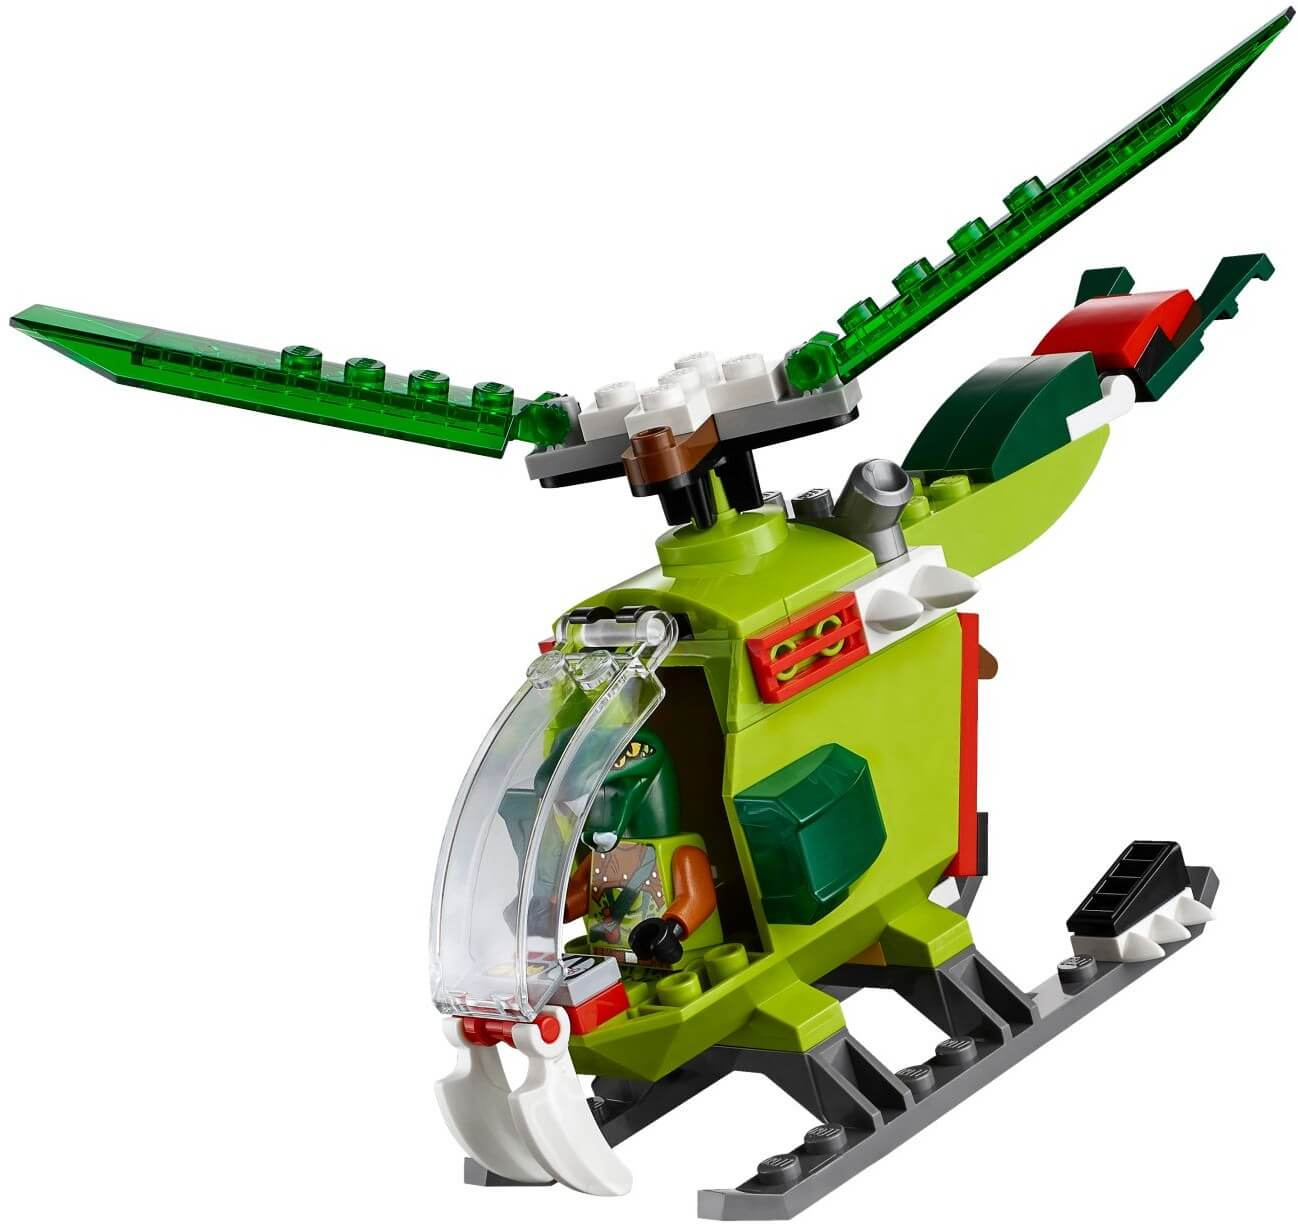 Mua đồ chơi LEGO 10725 - LEGO Juniors 10725 - Ngôi đền của các Ninja Ninjago (LEGO Juniors Lost Temple 10725)